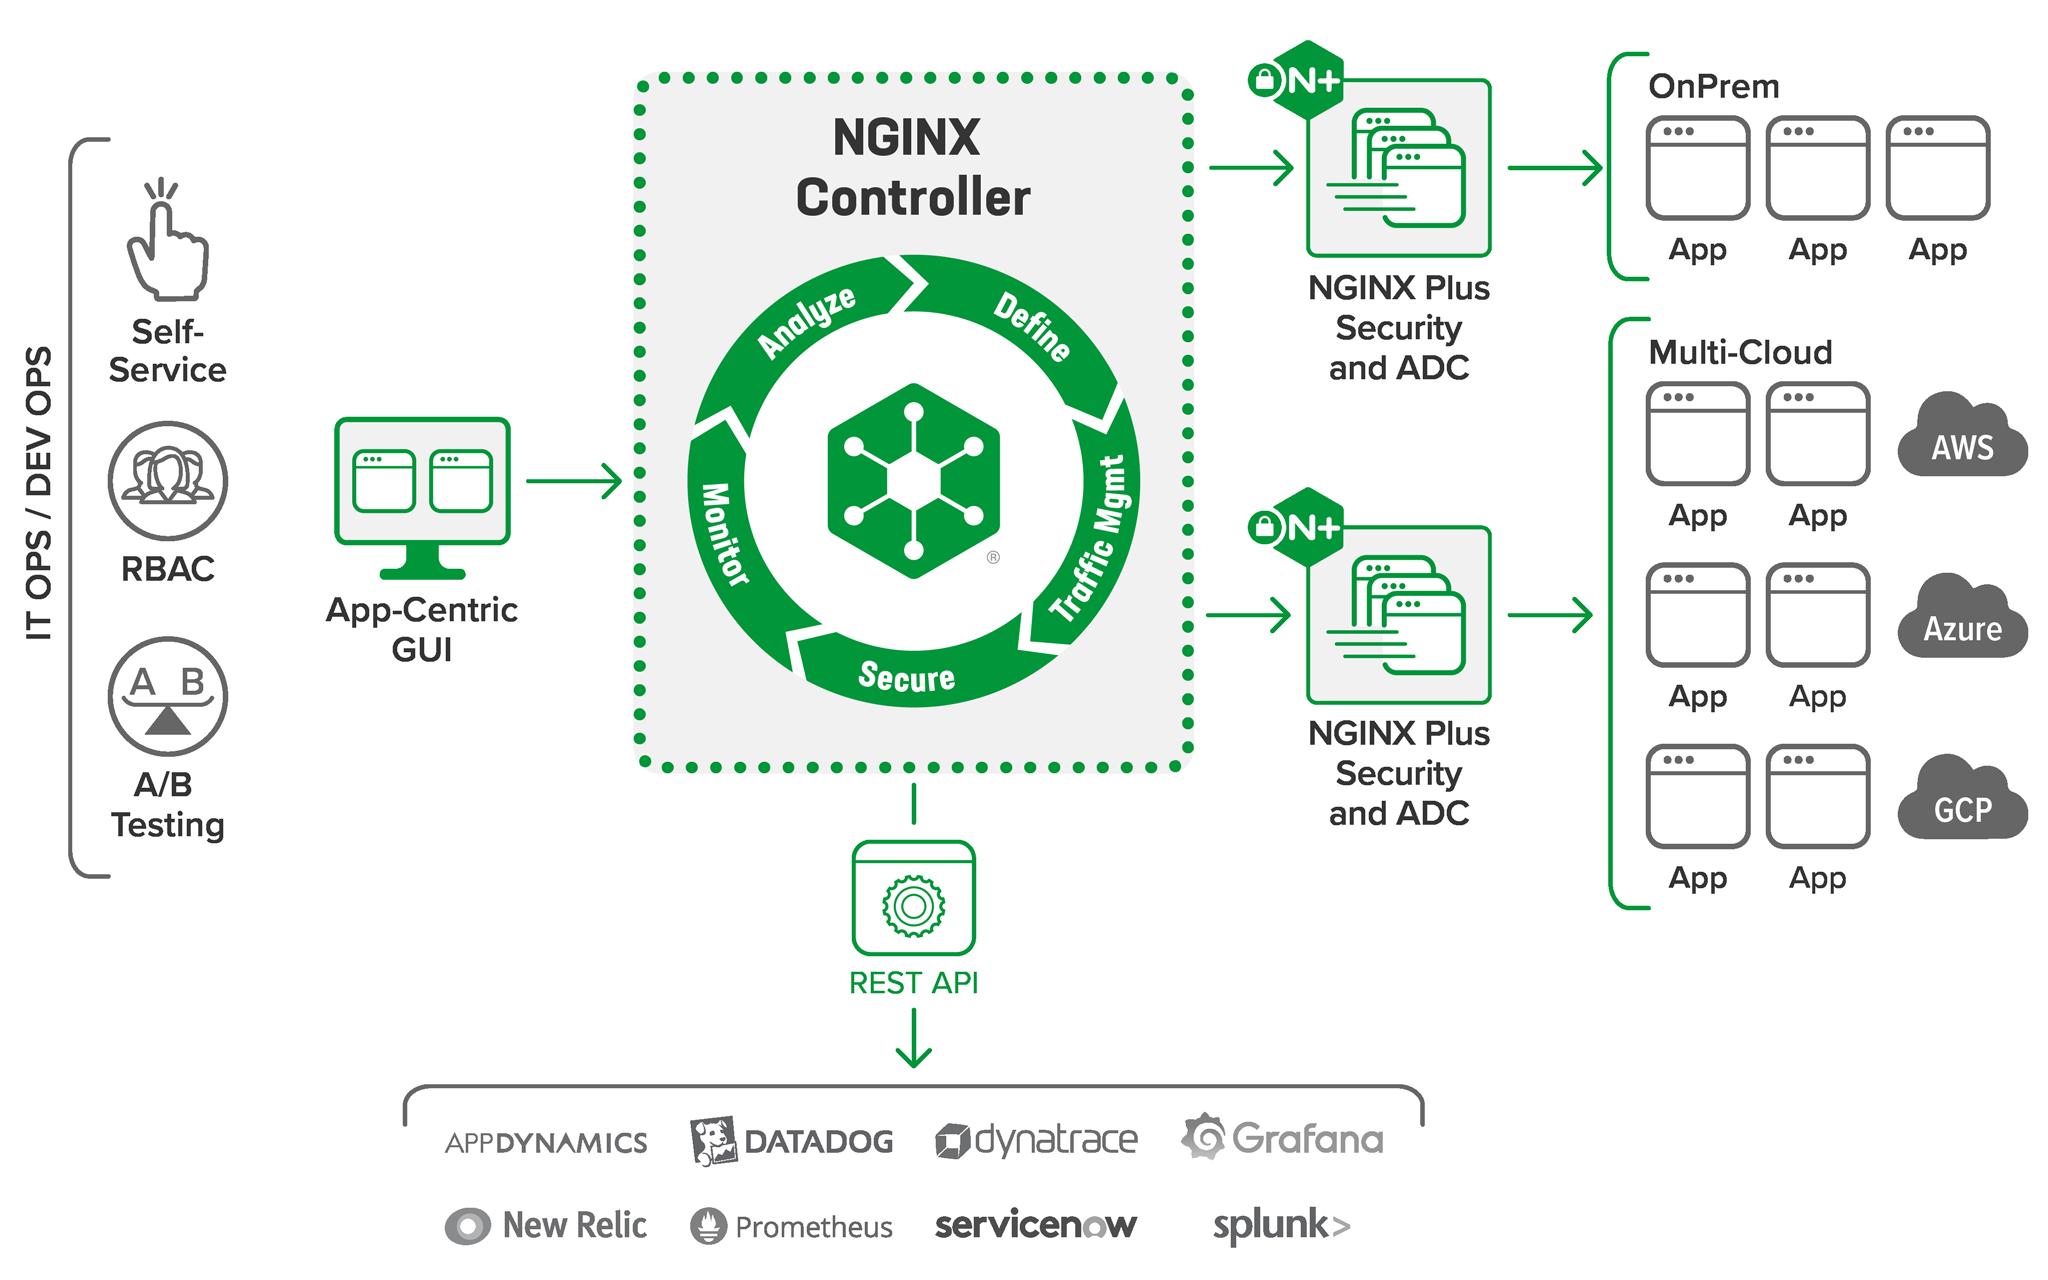 NGINX Controller topology for self-service